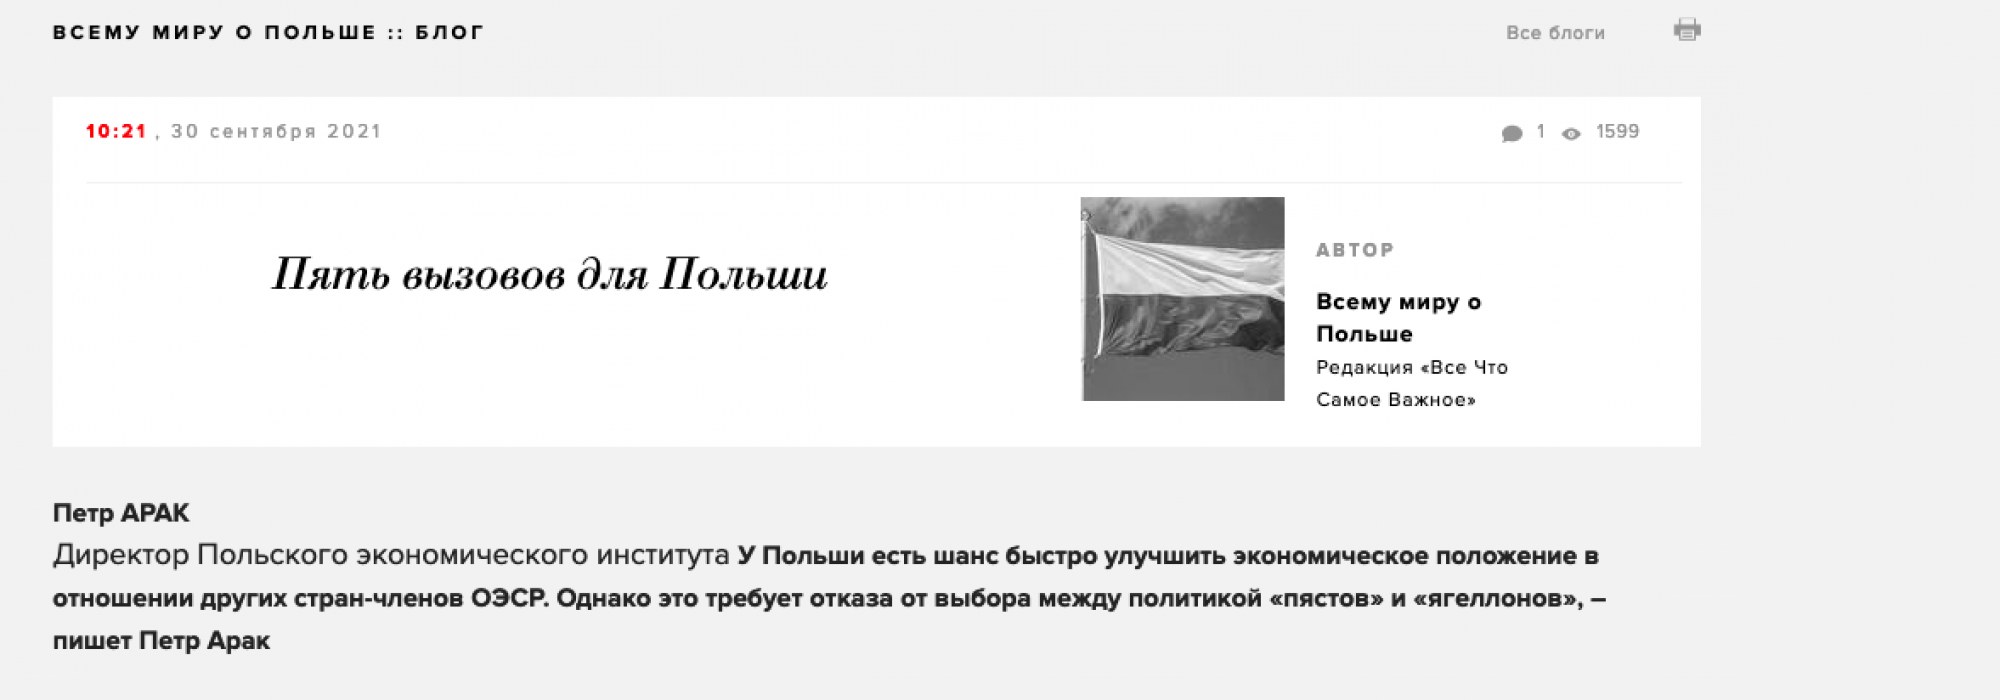 Zrzut ekranu 2021-10-1 o 15.02.56